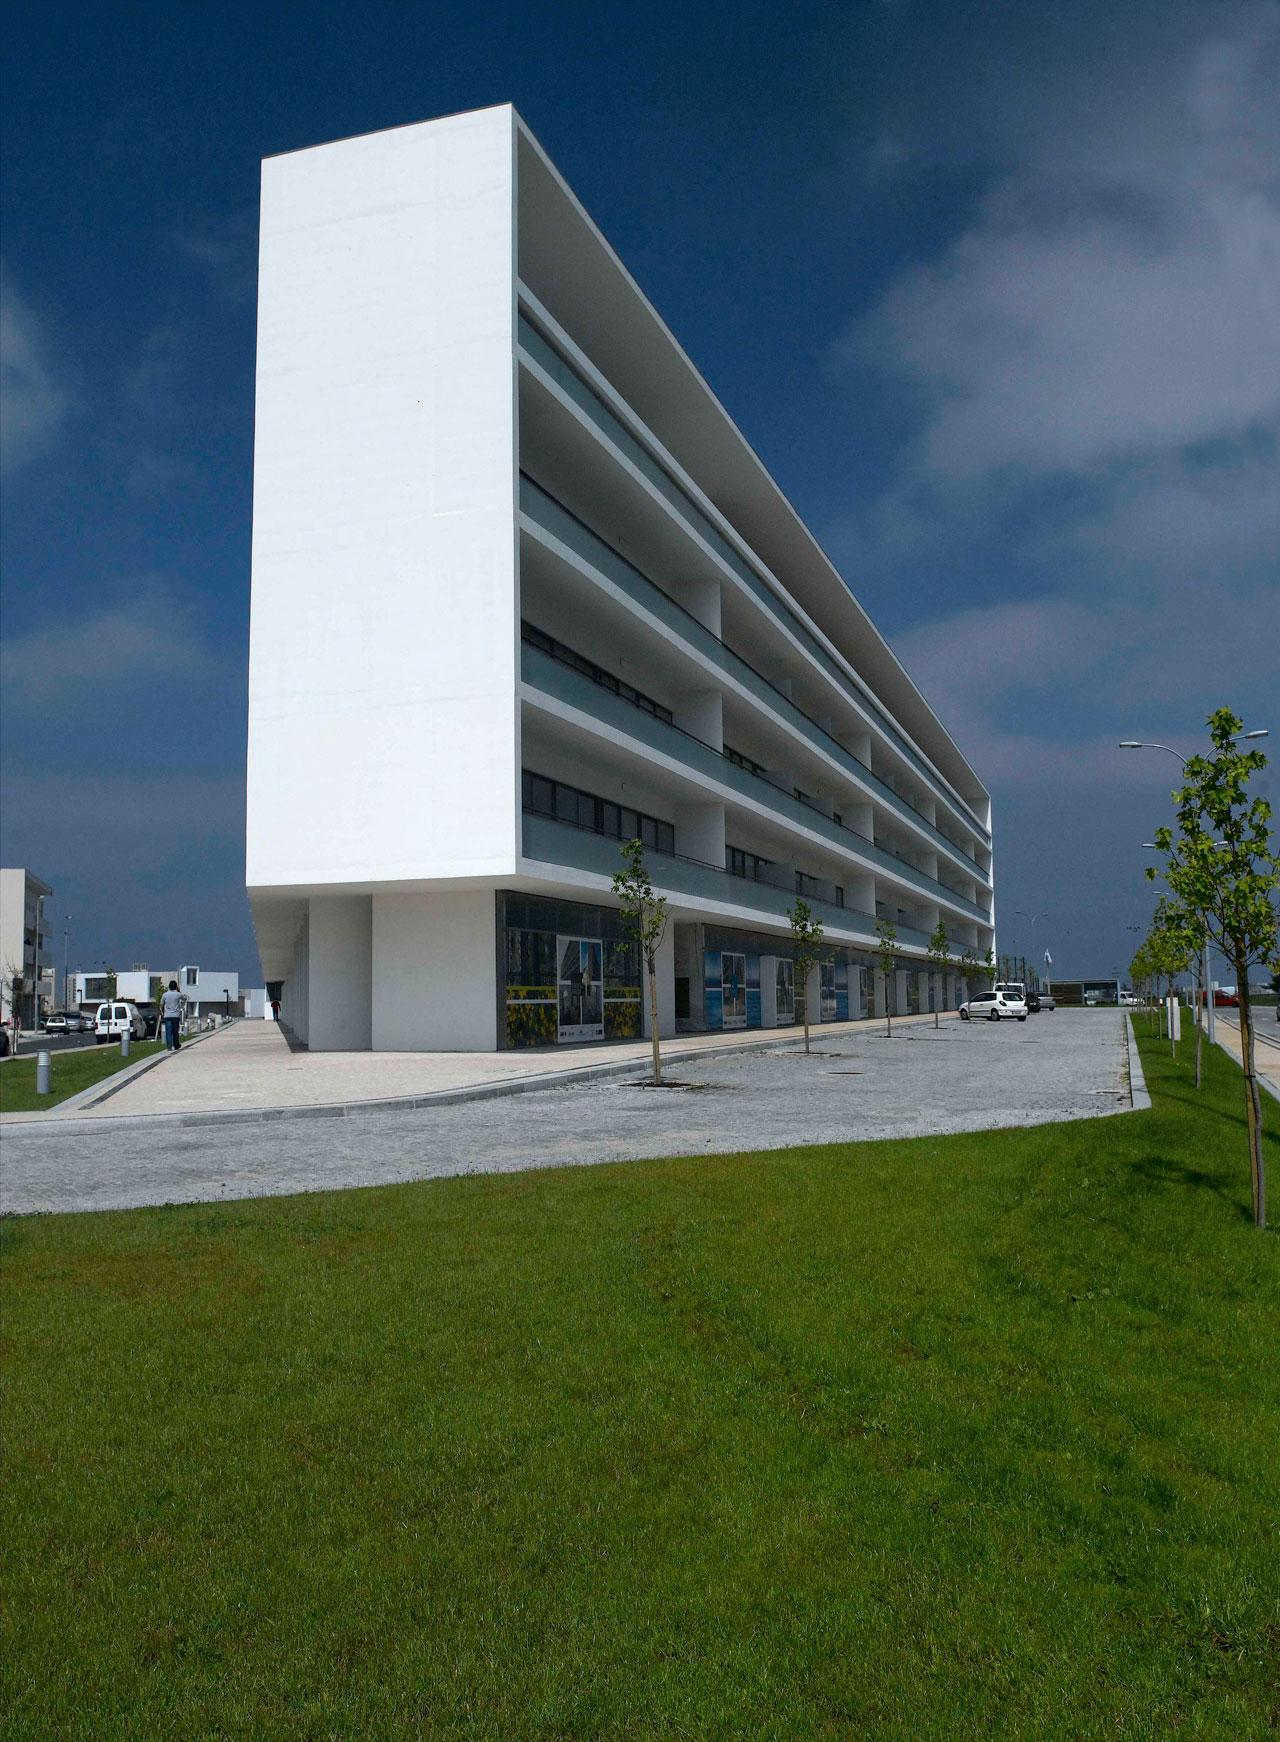 Edif cio de habita o da p voa de varzim topos atelier for Atelier arquitectura